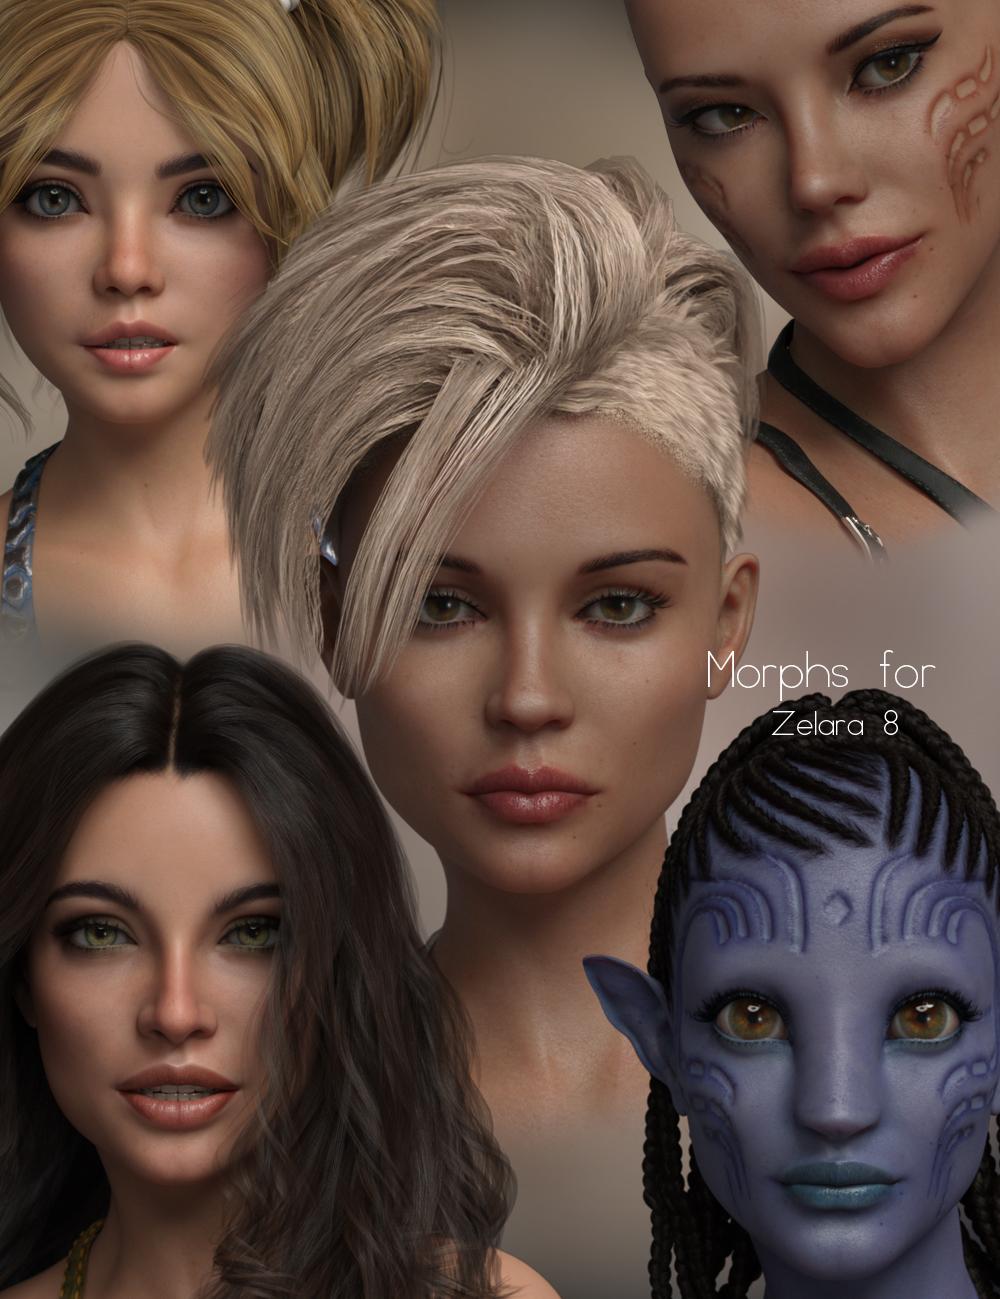 P3D Zelara 8 HD Enhanced Morphs Package by: P3Design, 3D Models by Daz 3D